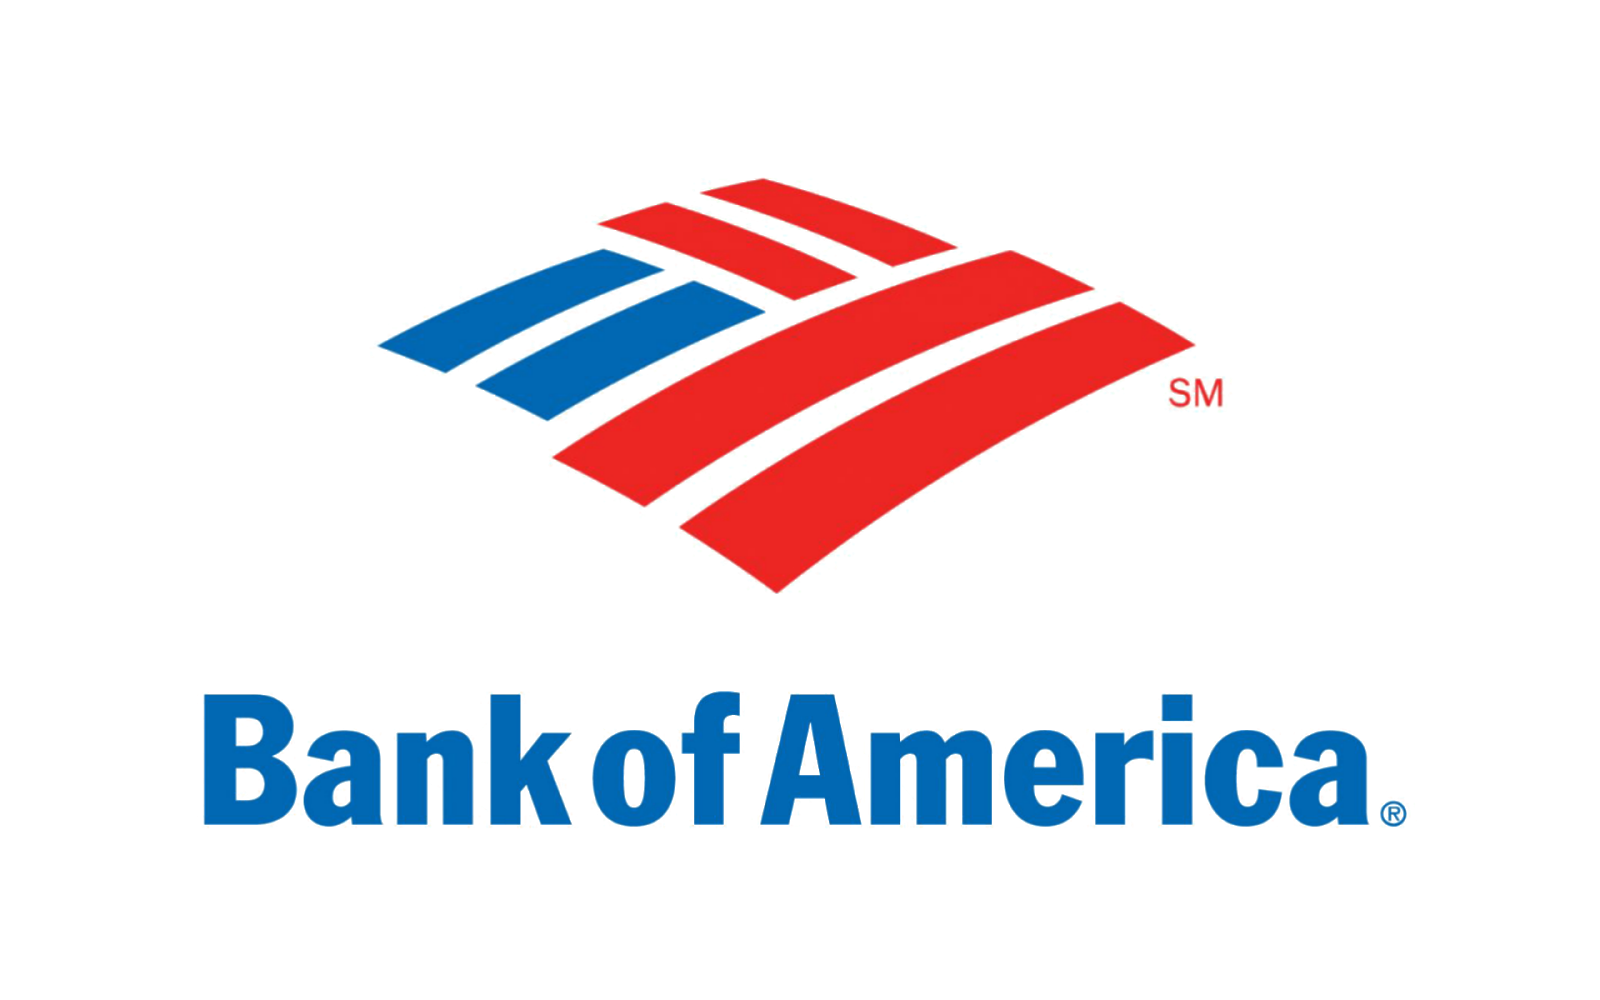 Bank of America Logo PNG Format